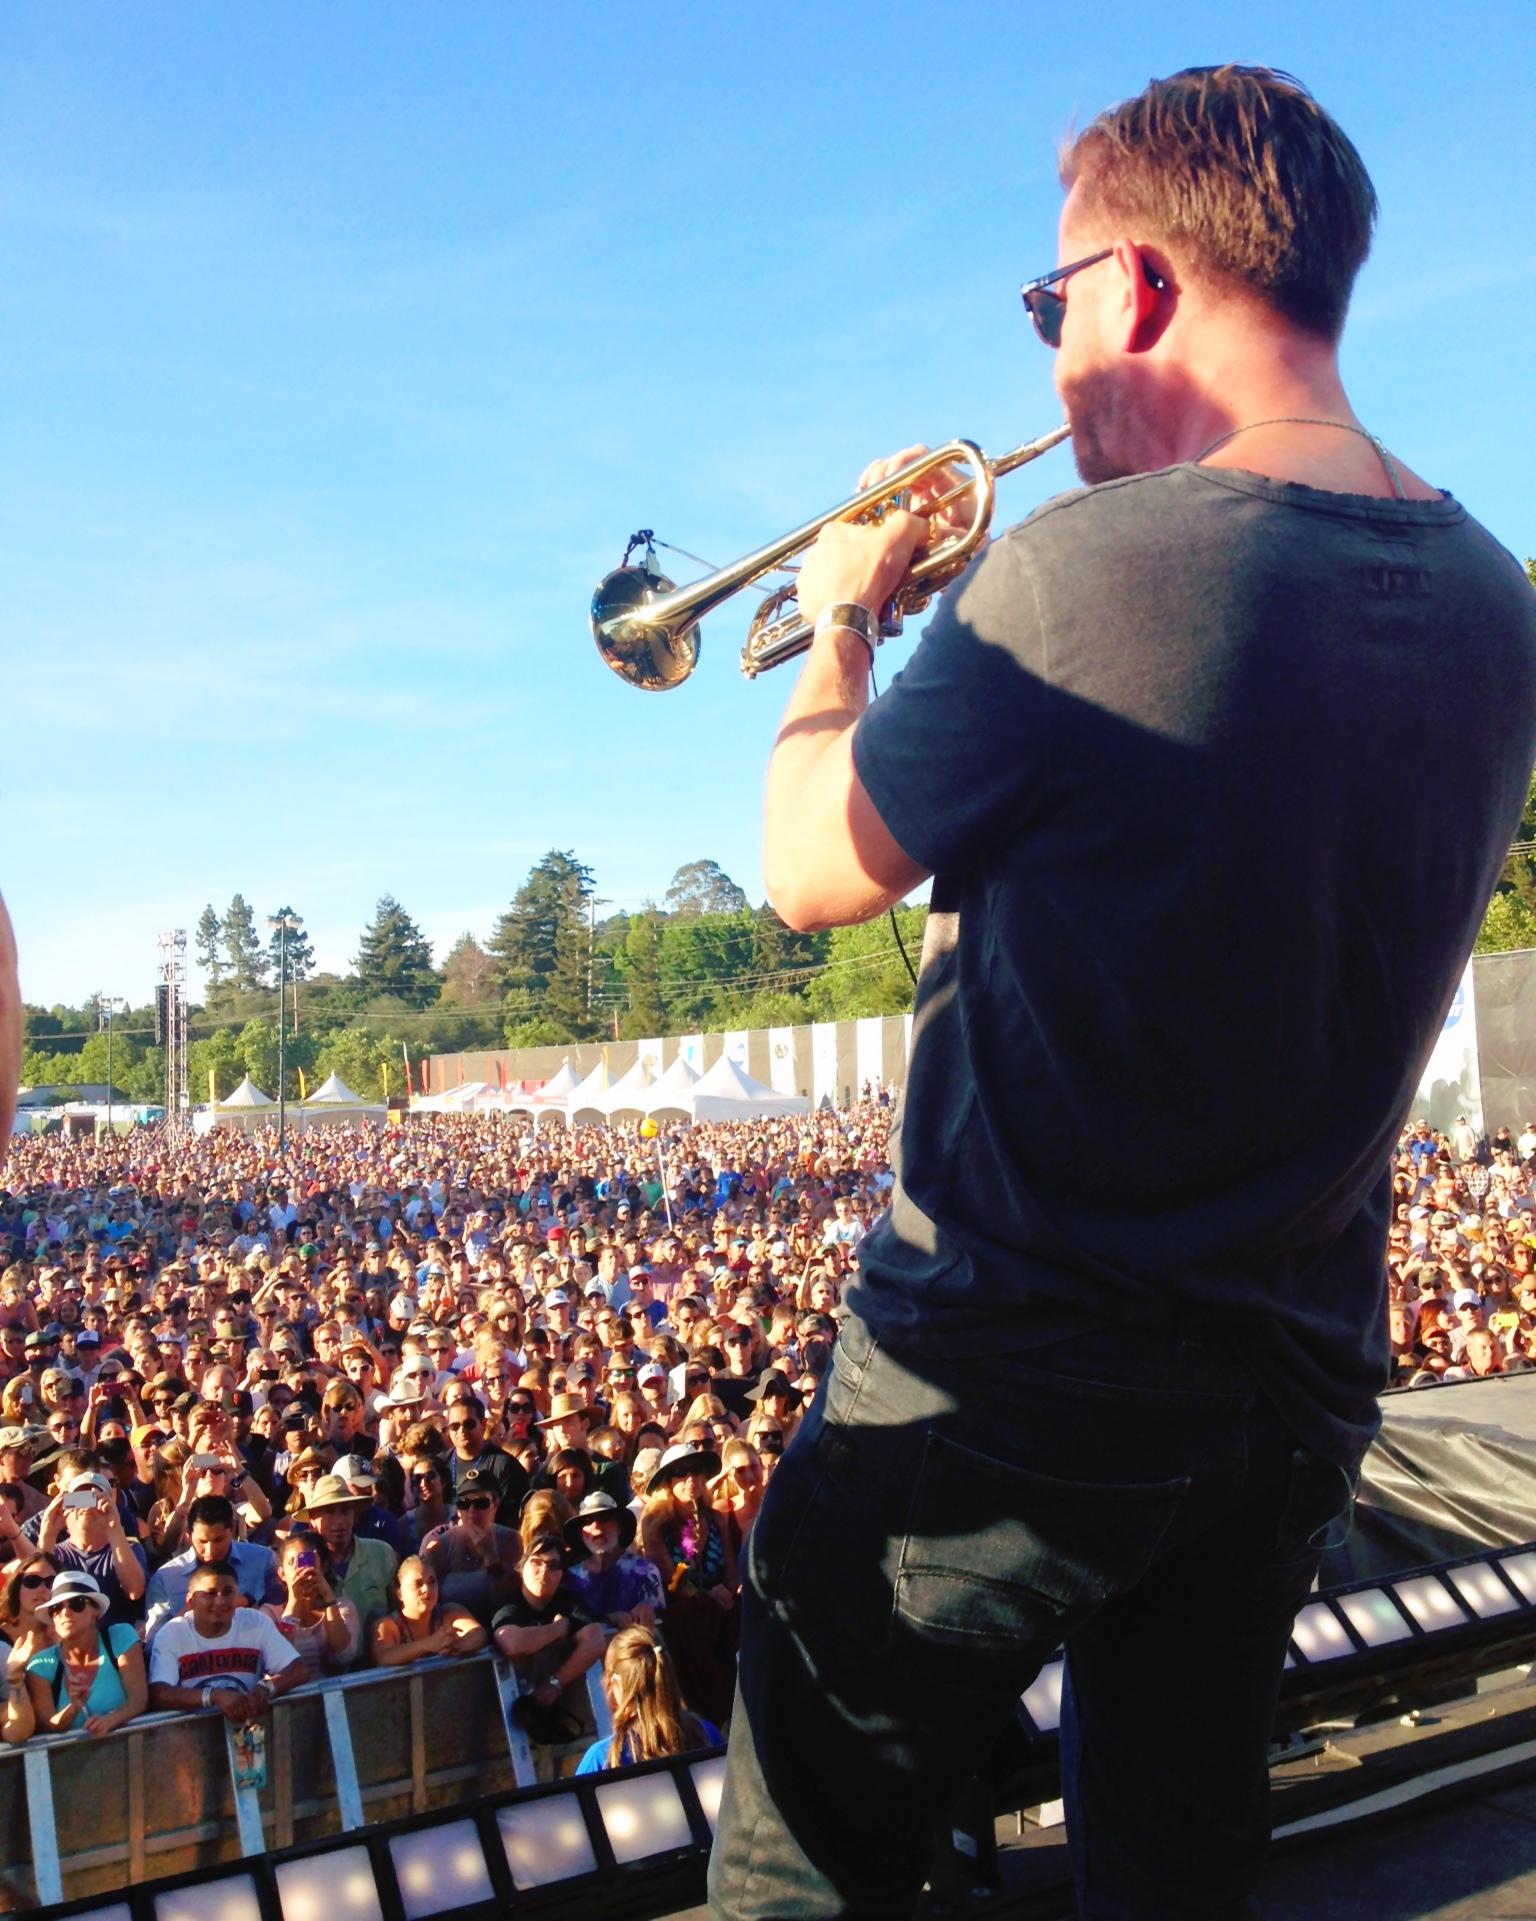 Train 2014, BottleRock Festival